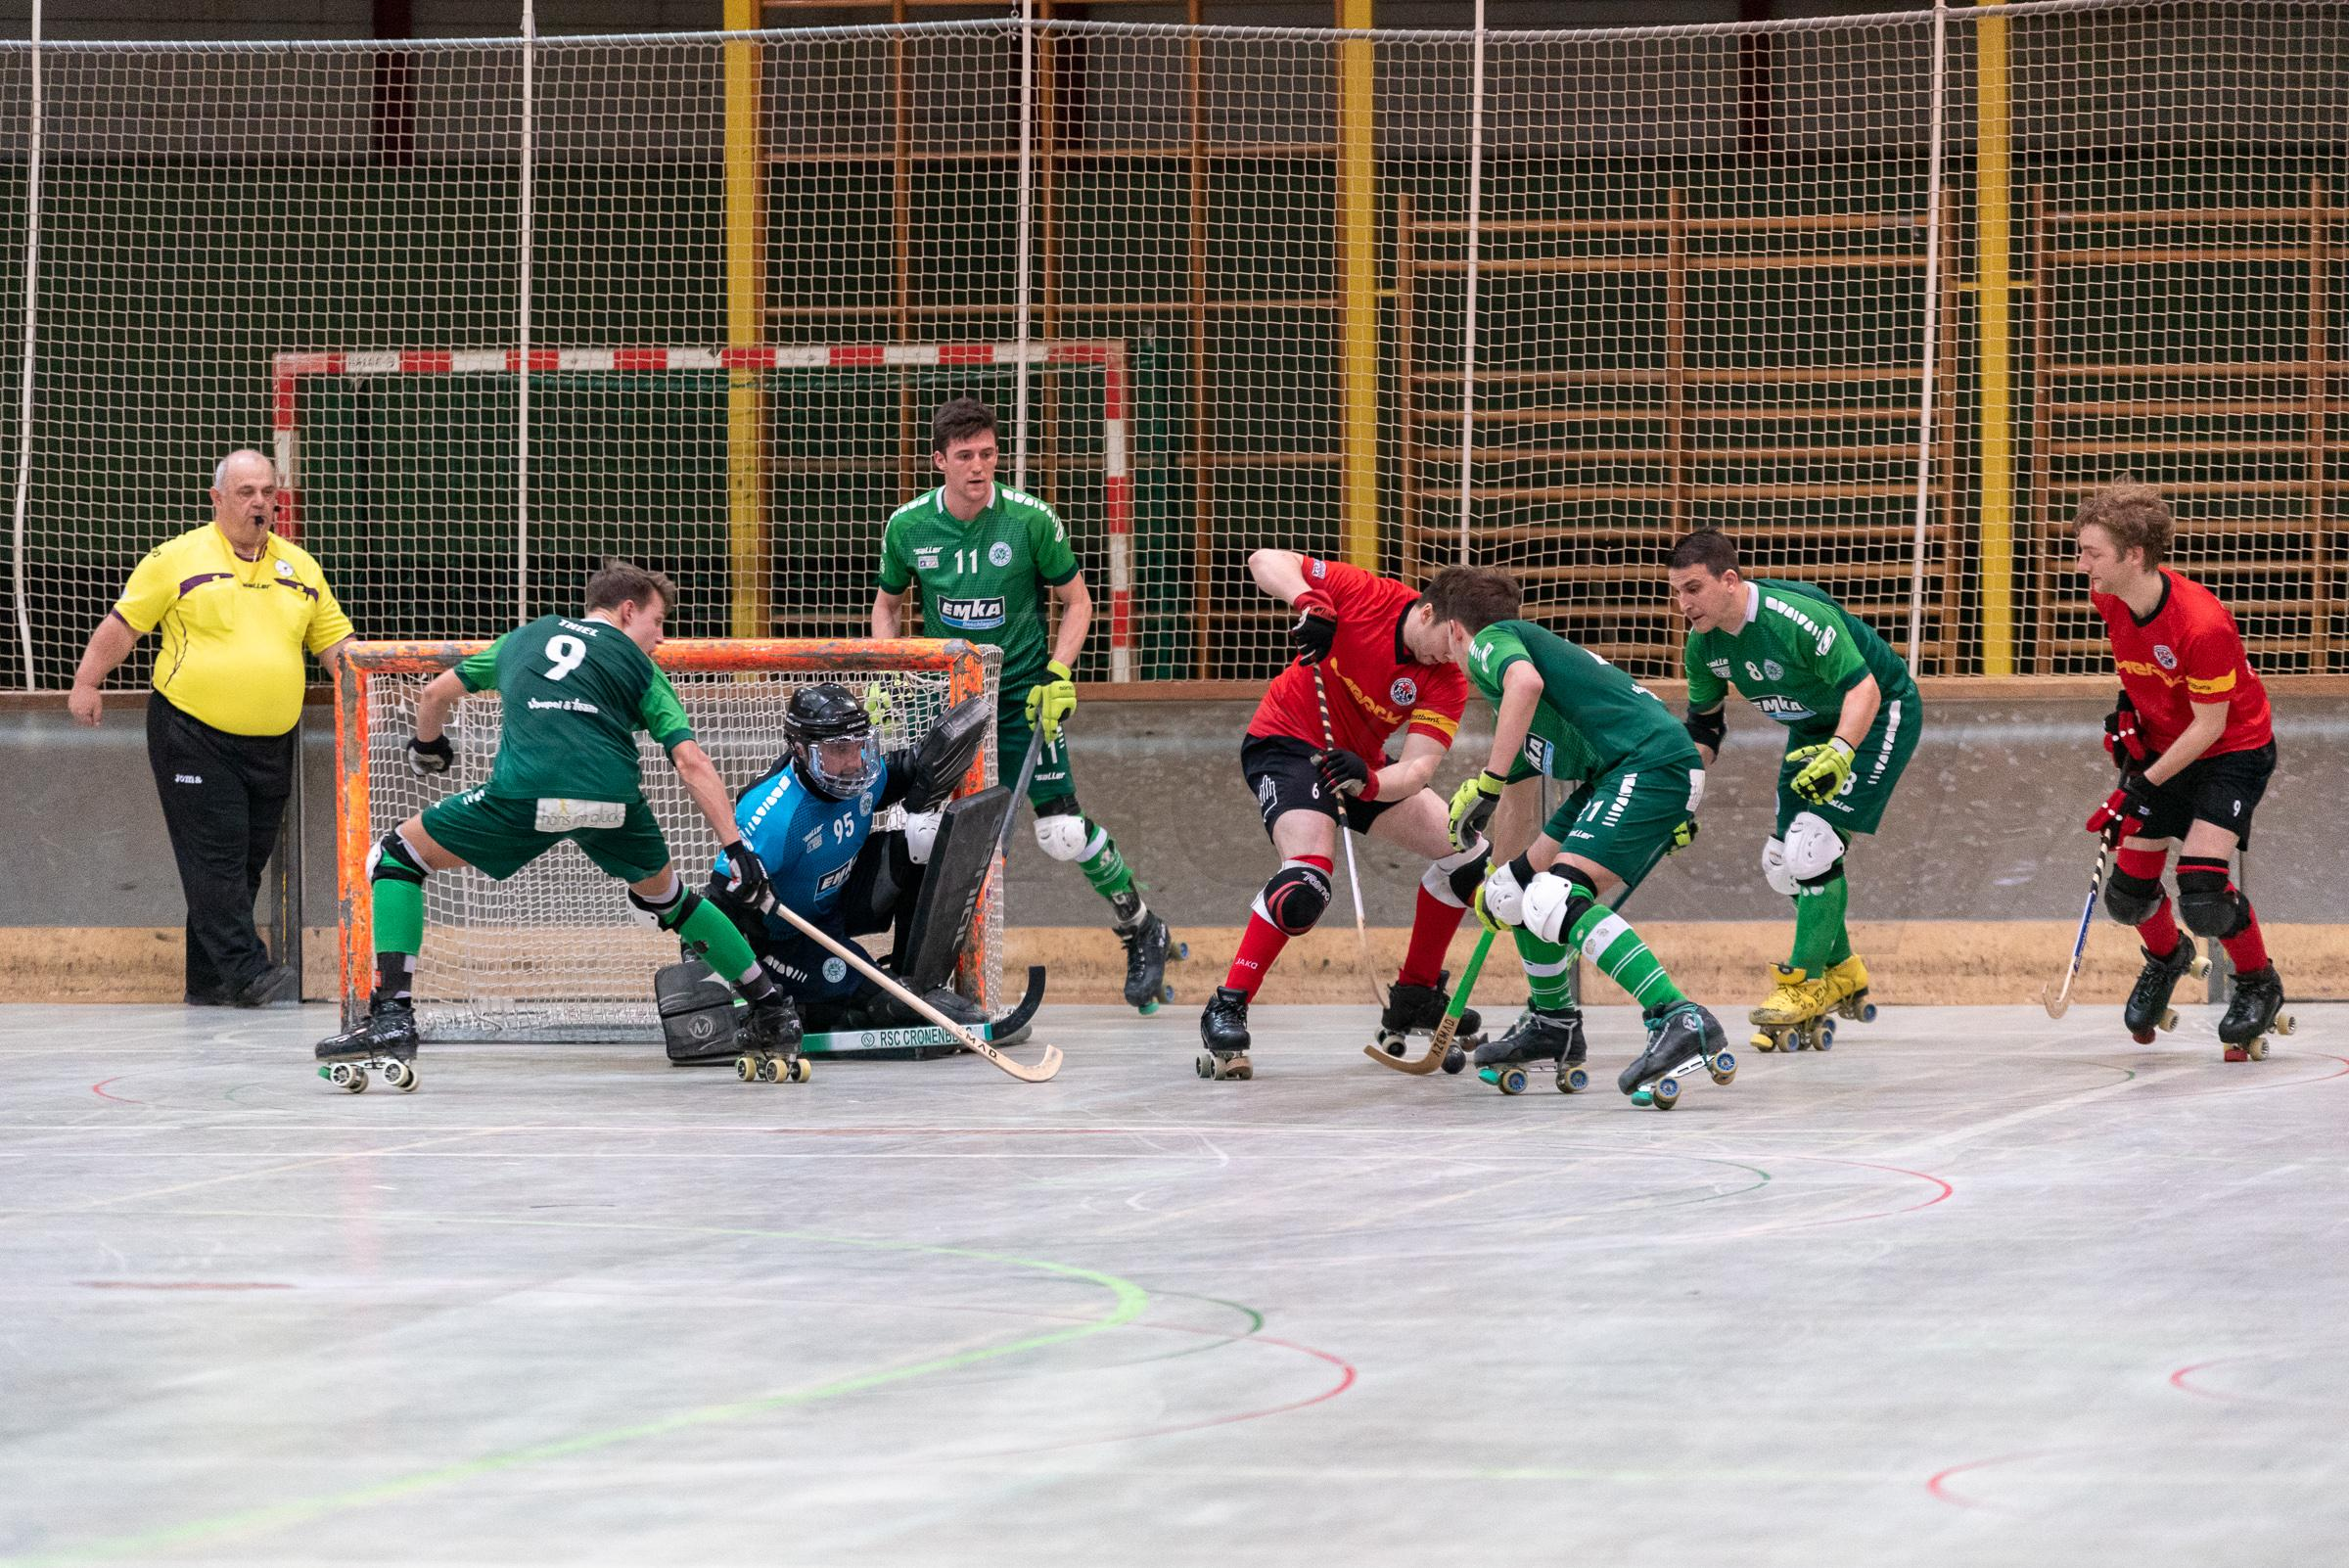 RSC Cronenberg Rollhockey DRIV-Pokal Halbfinale Herren 30.03.2019